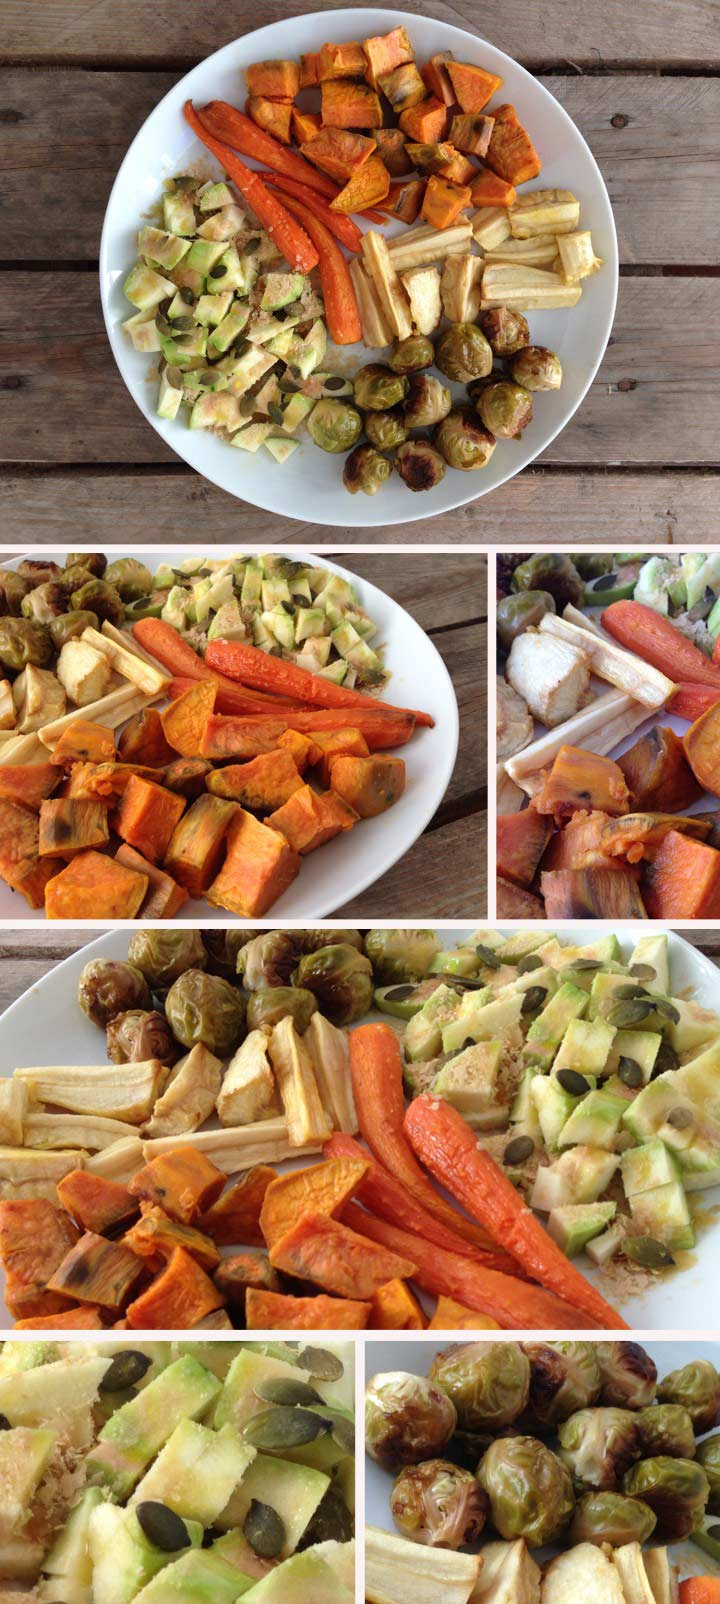 Ingredients verdures al forn